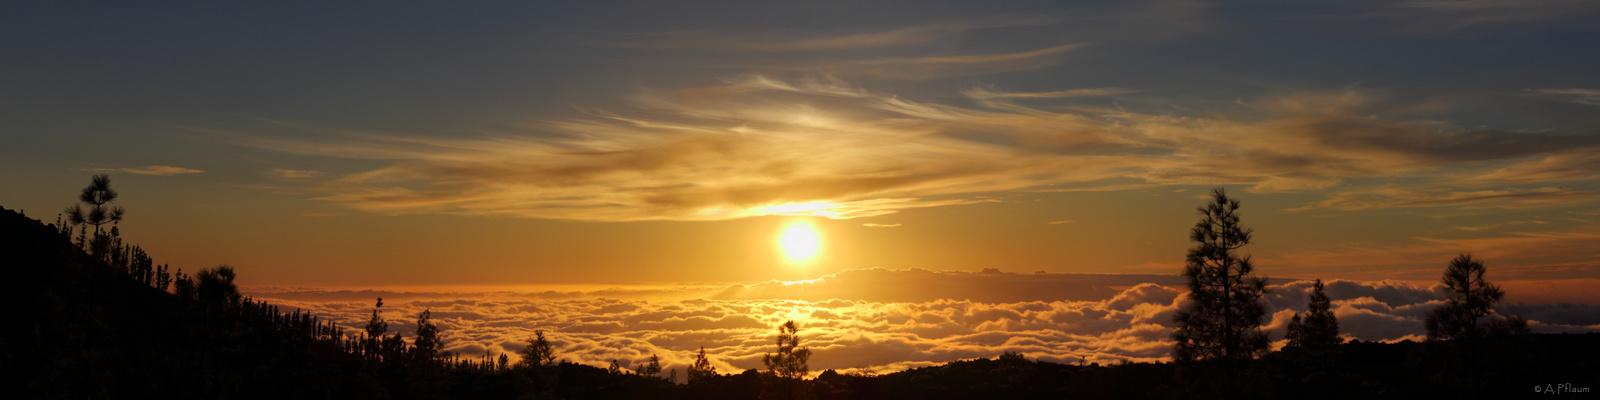 .Sunset Canary Island.